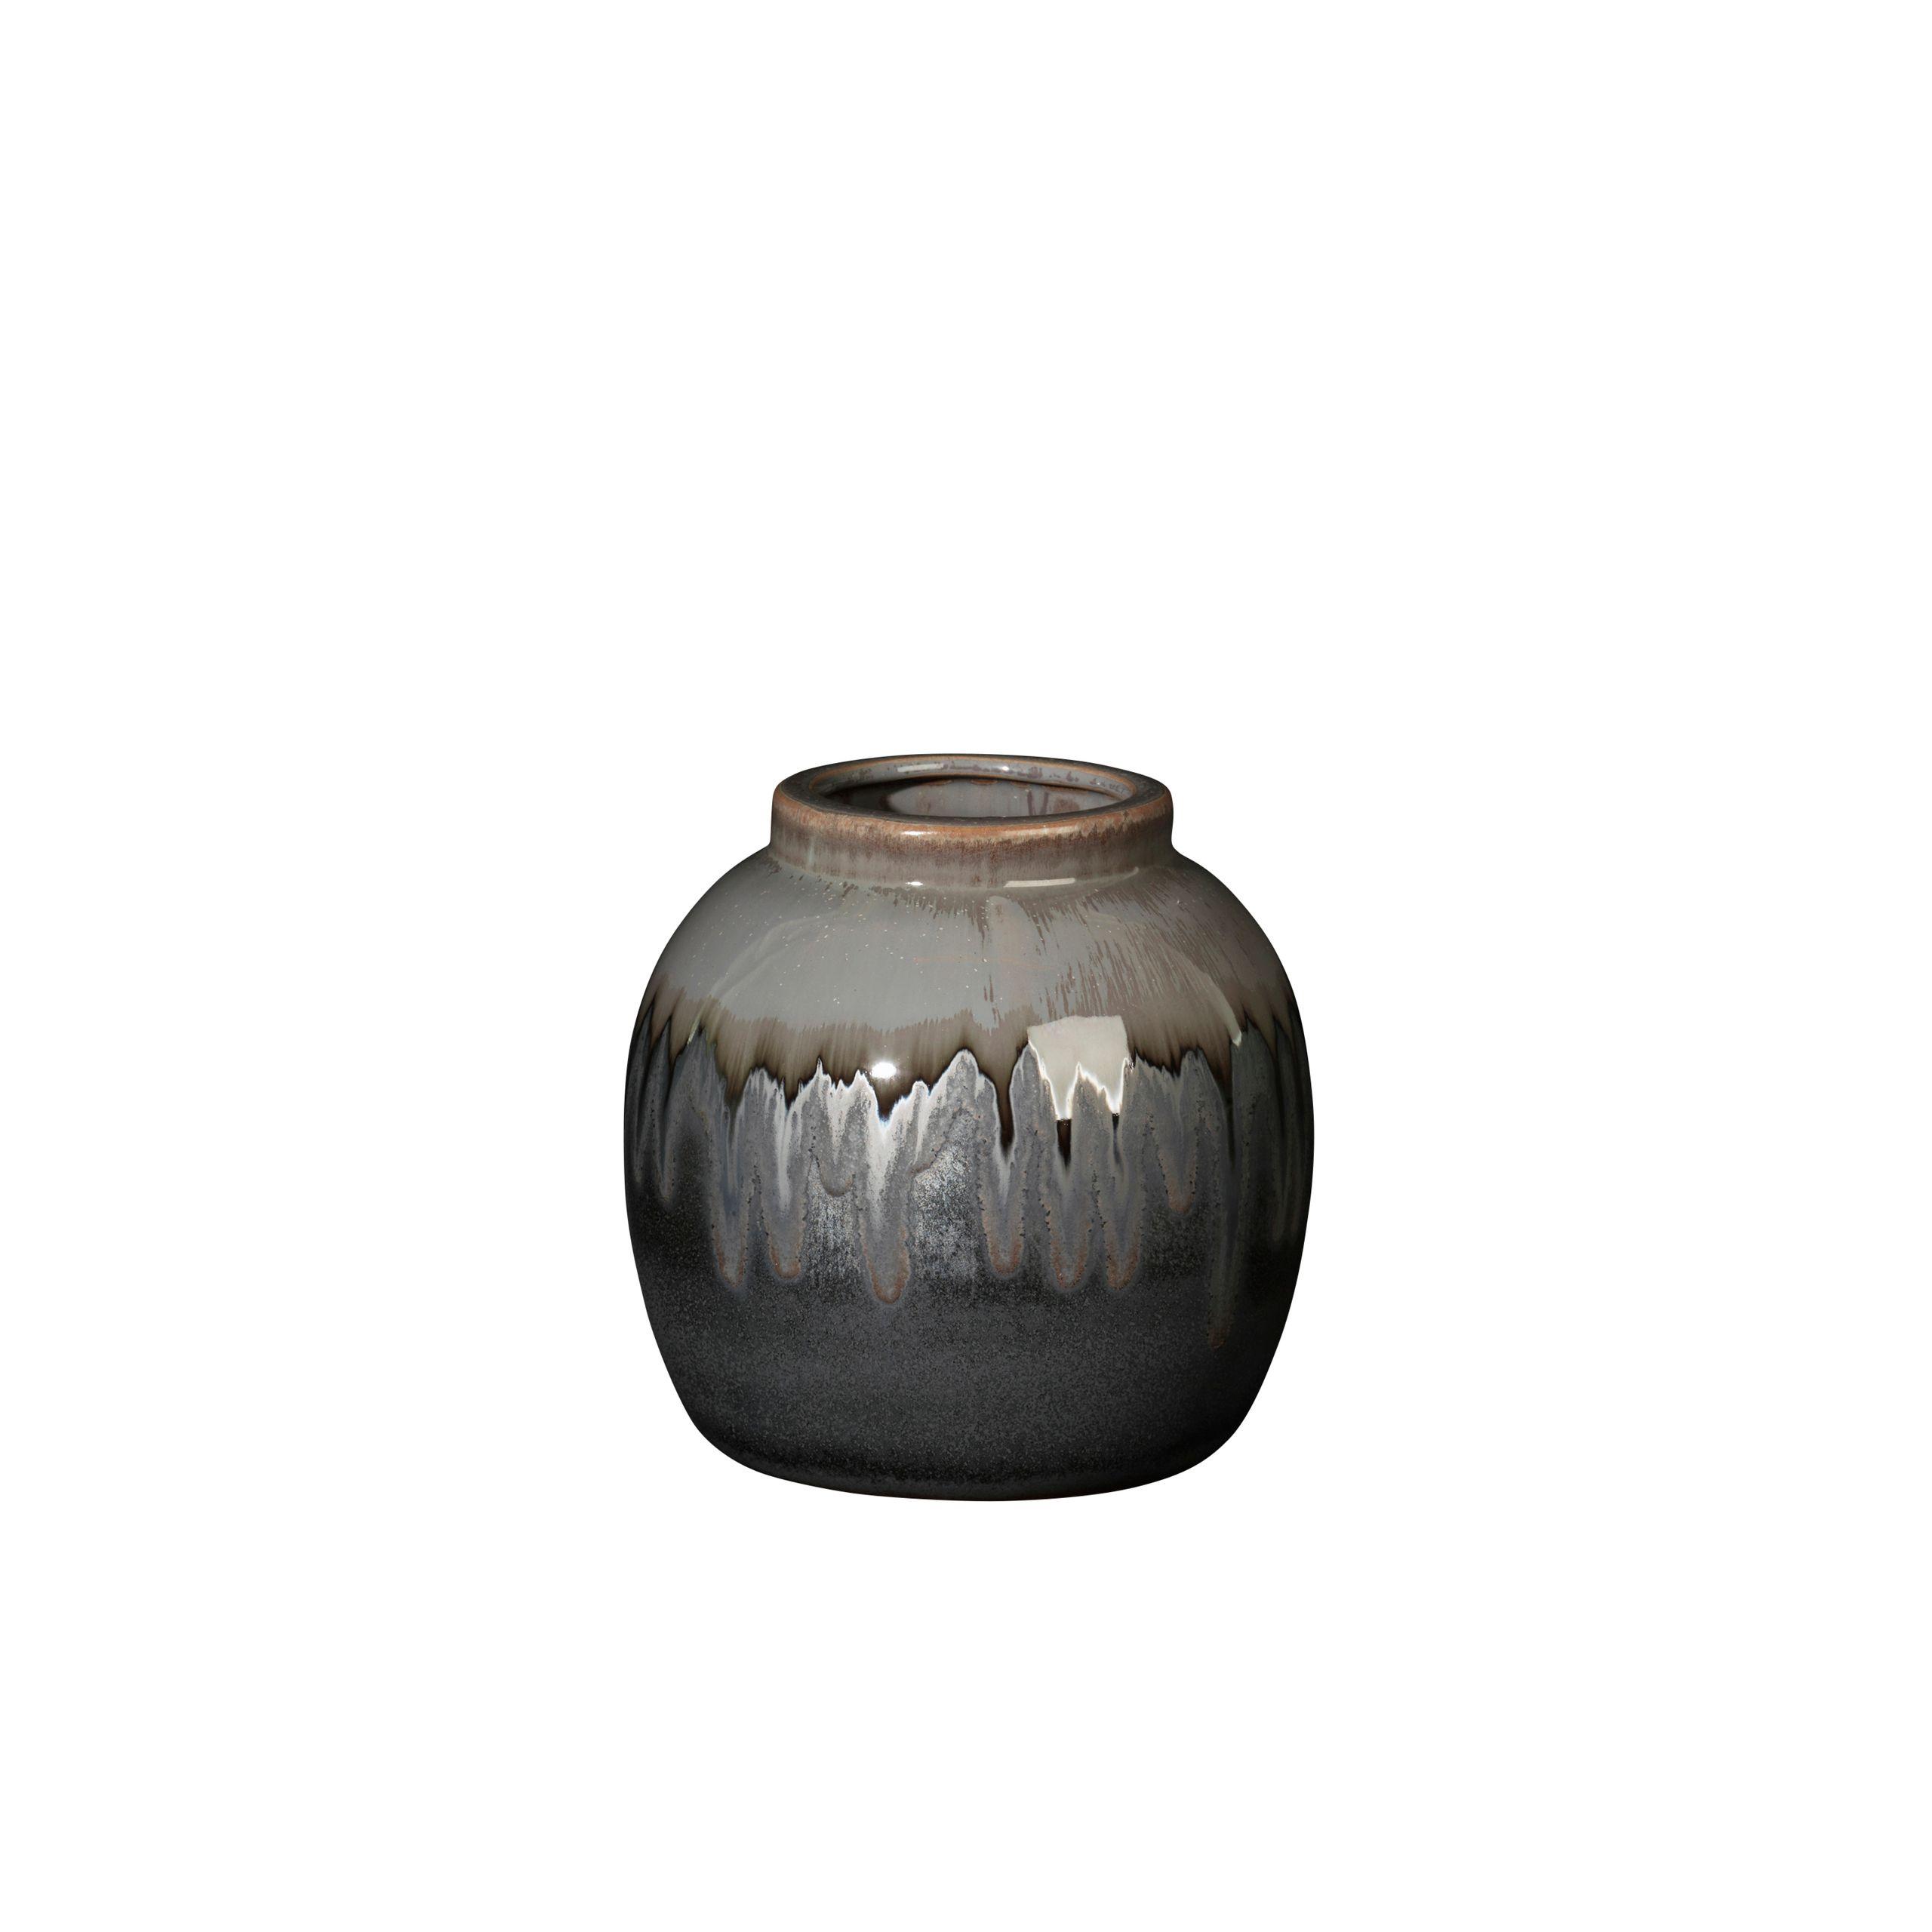 Laust vase